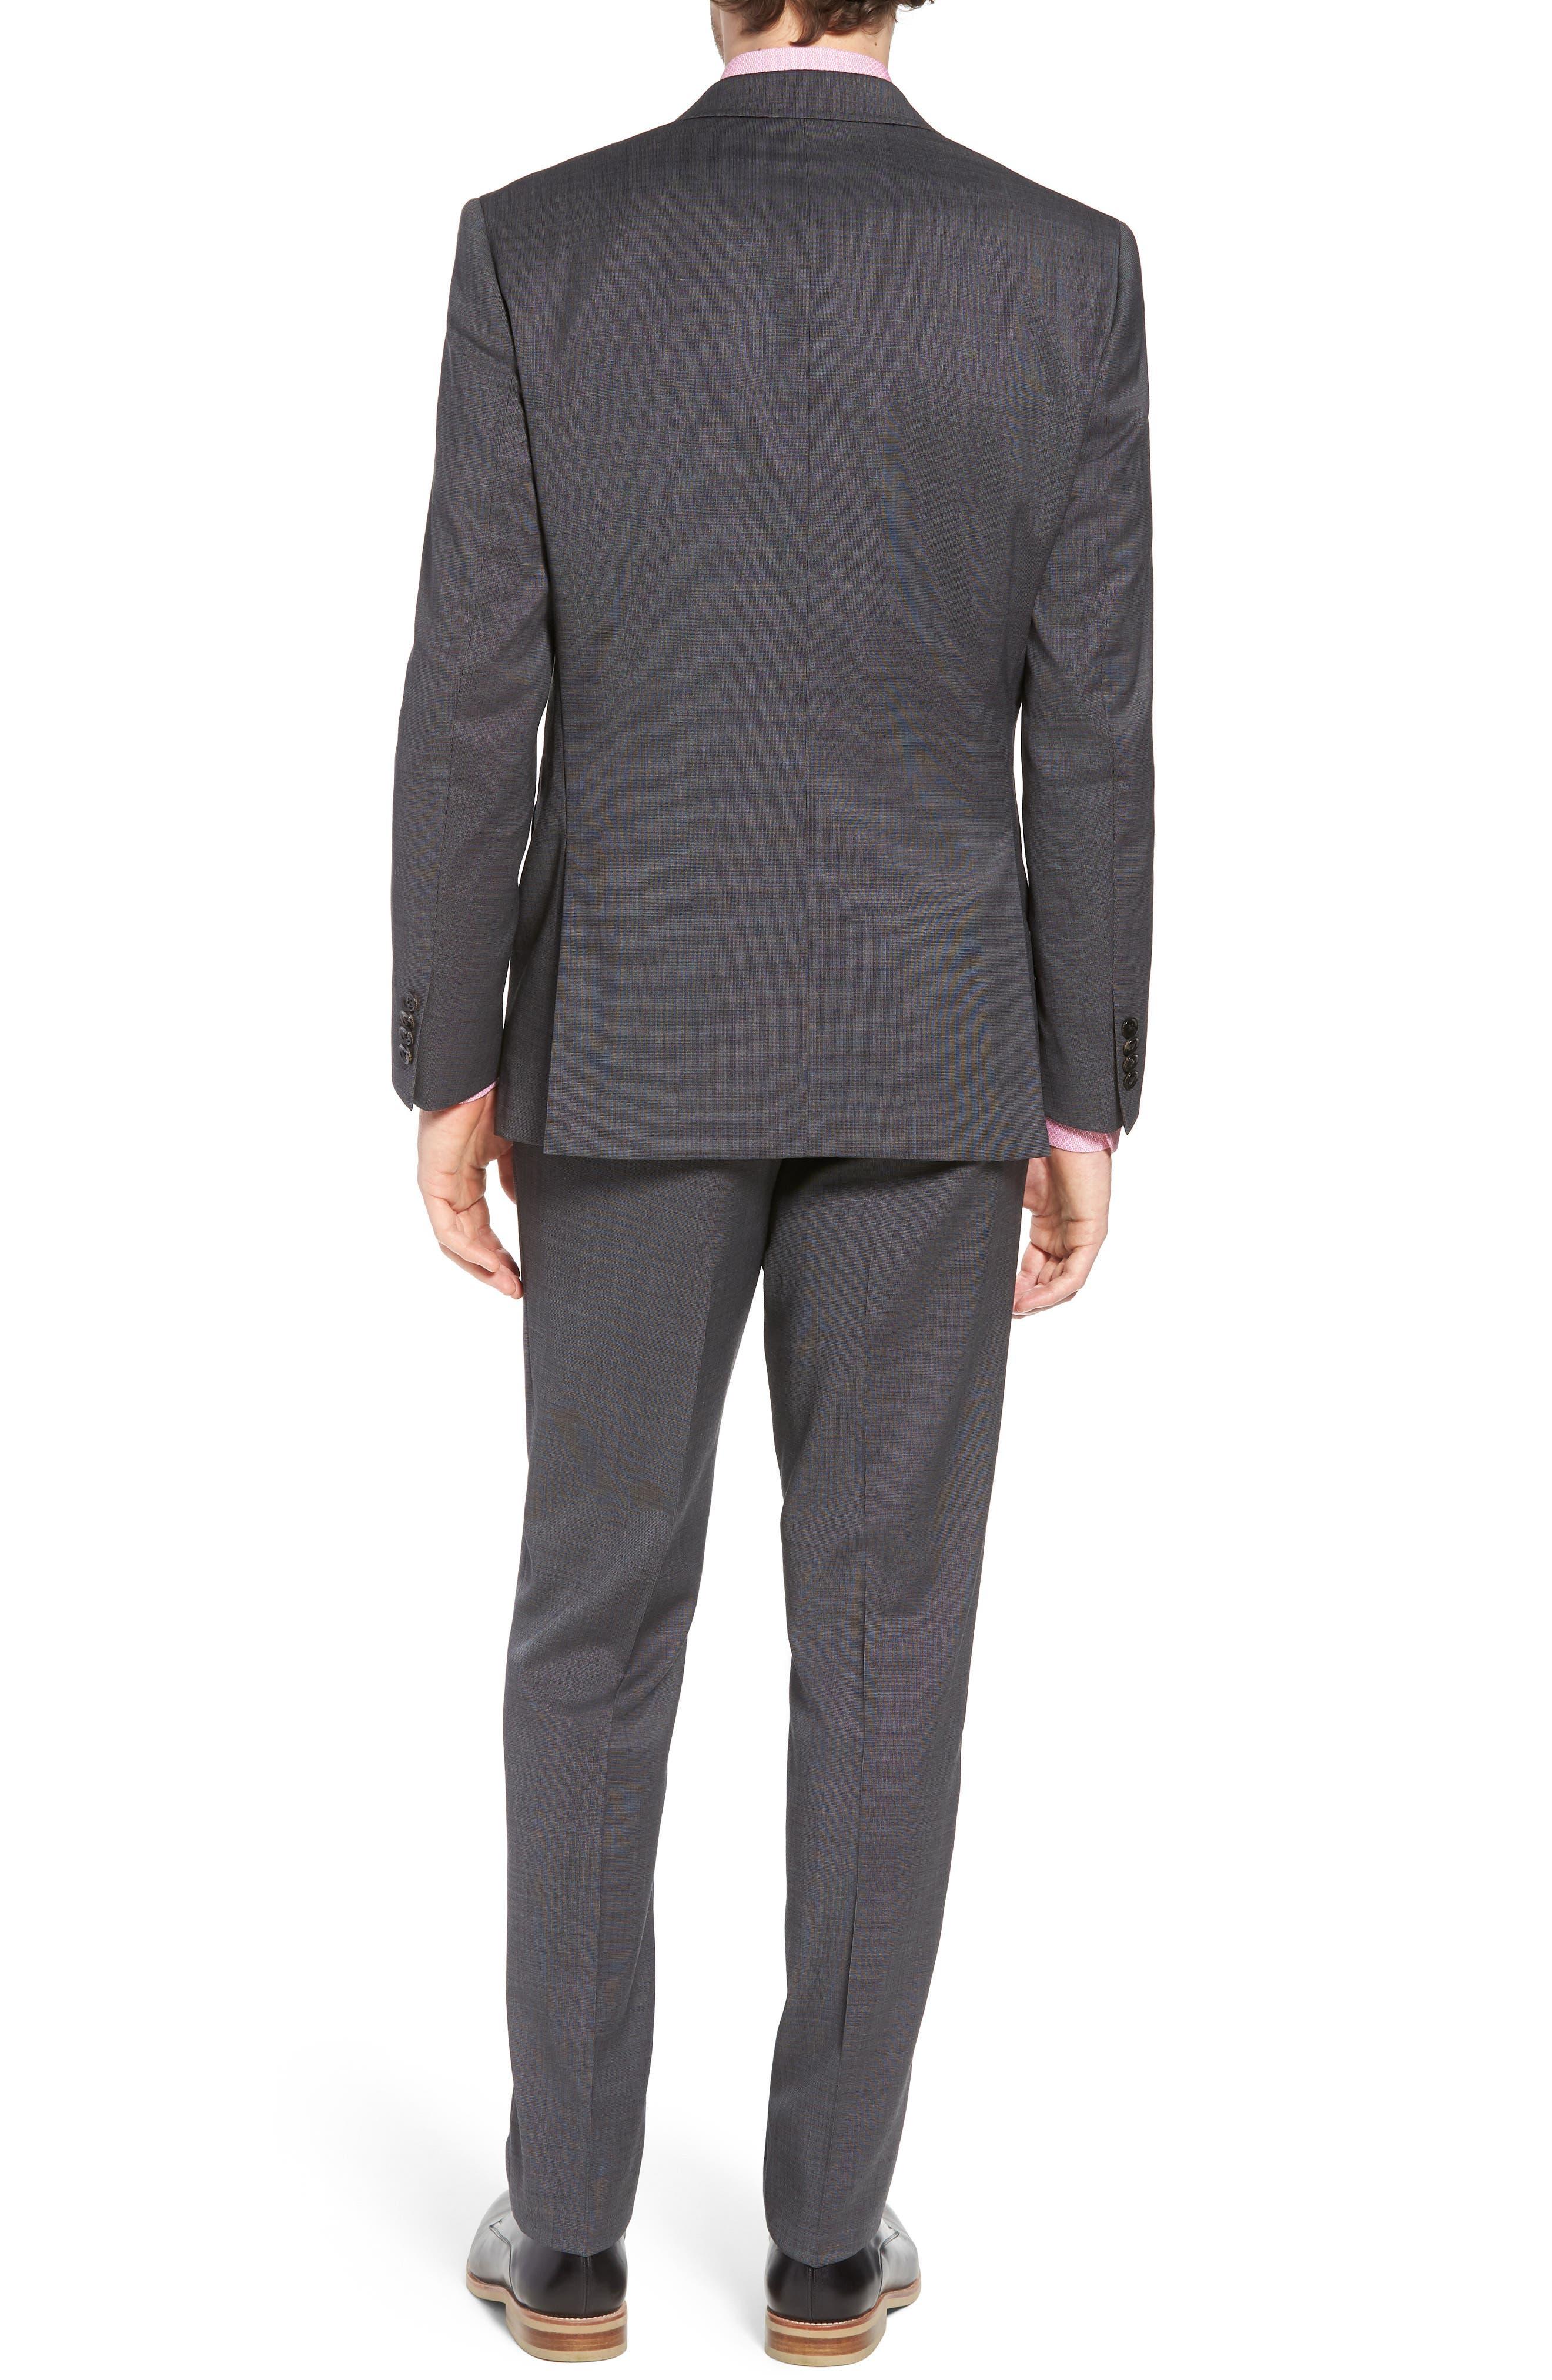 Jay Trim Fit Solid Wool Suit,                             Alternate thumbnail 2, color,                             020